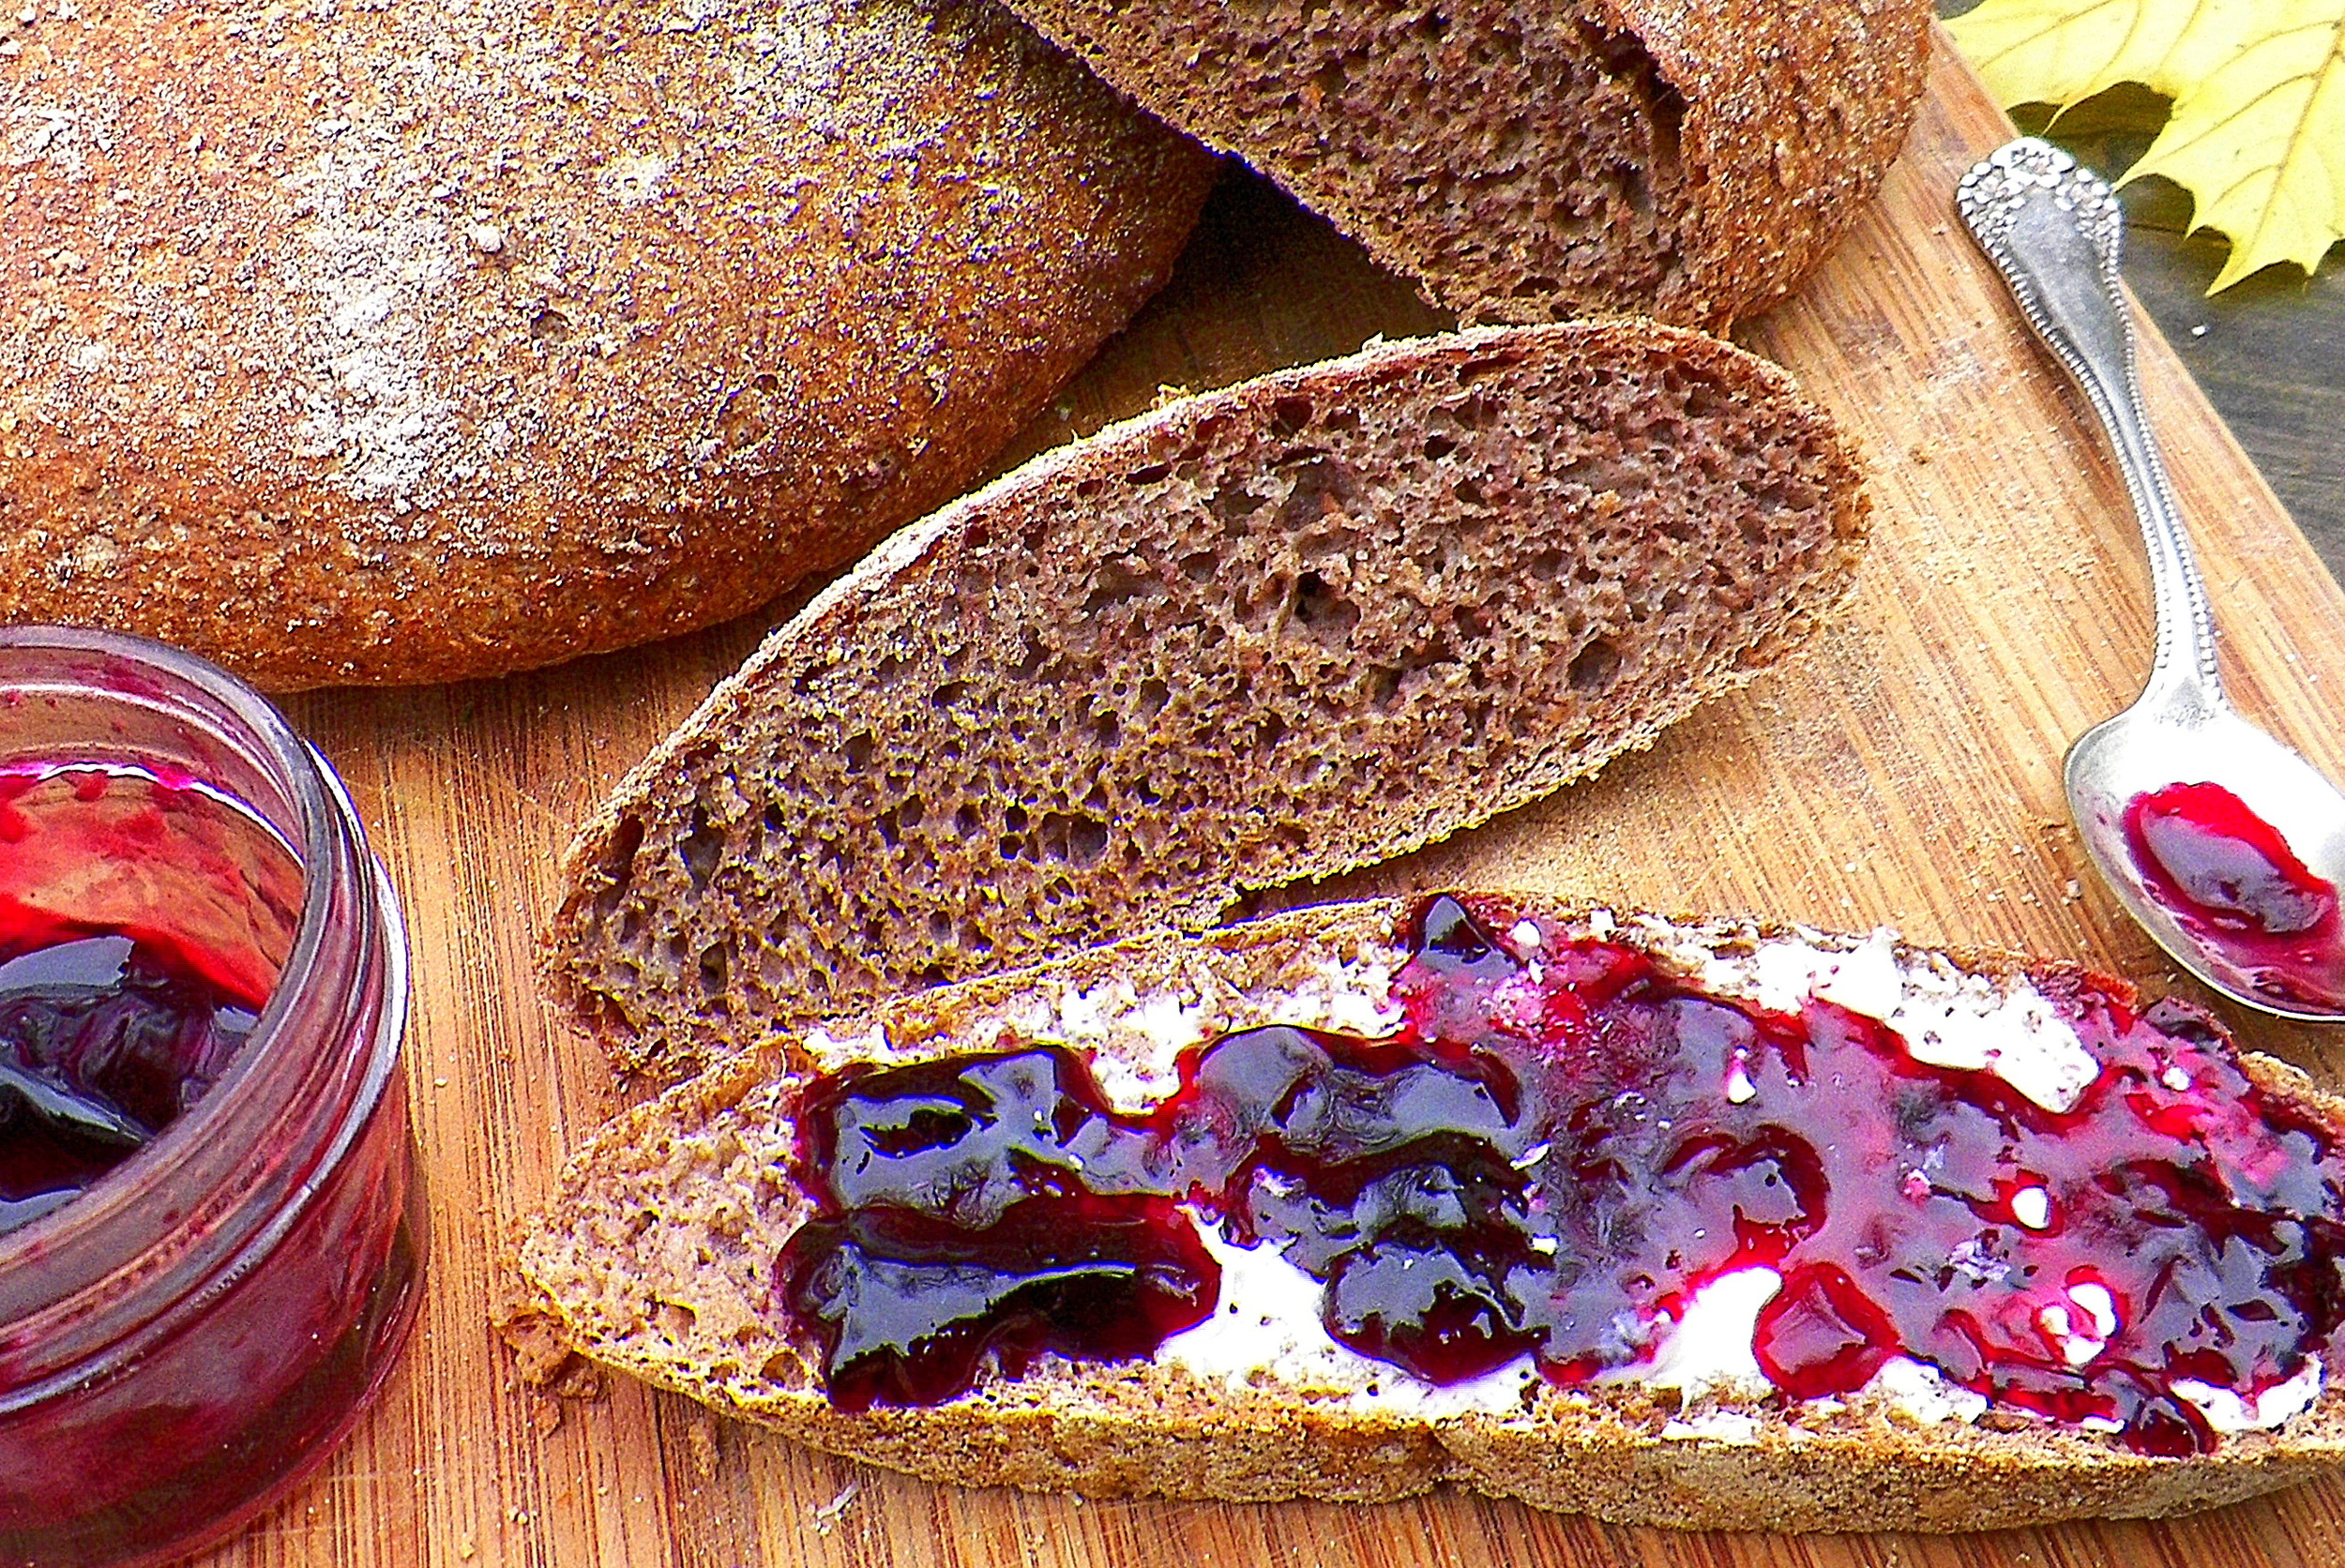 Acorn flour bread with wild grape jelly.